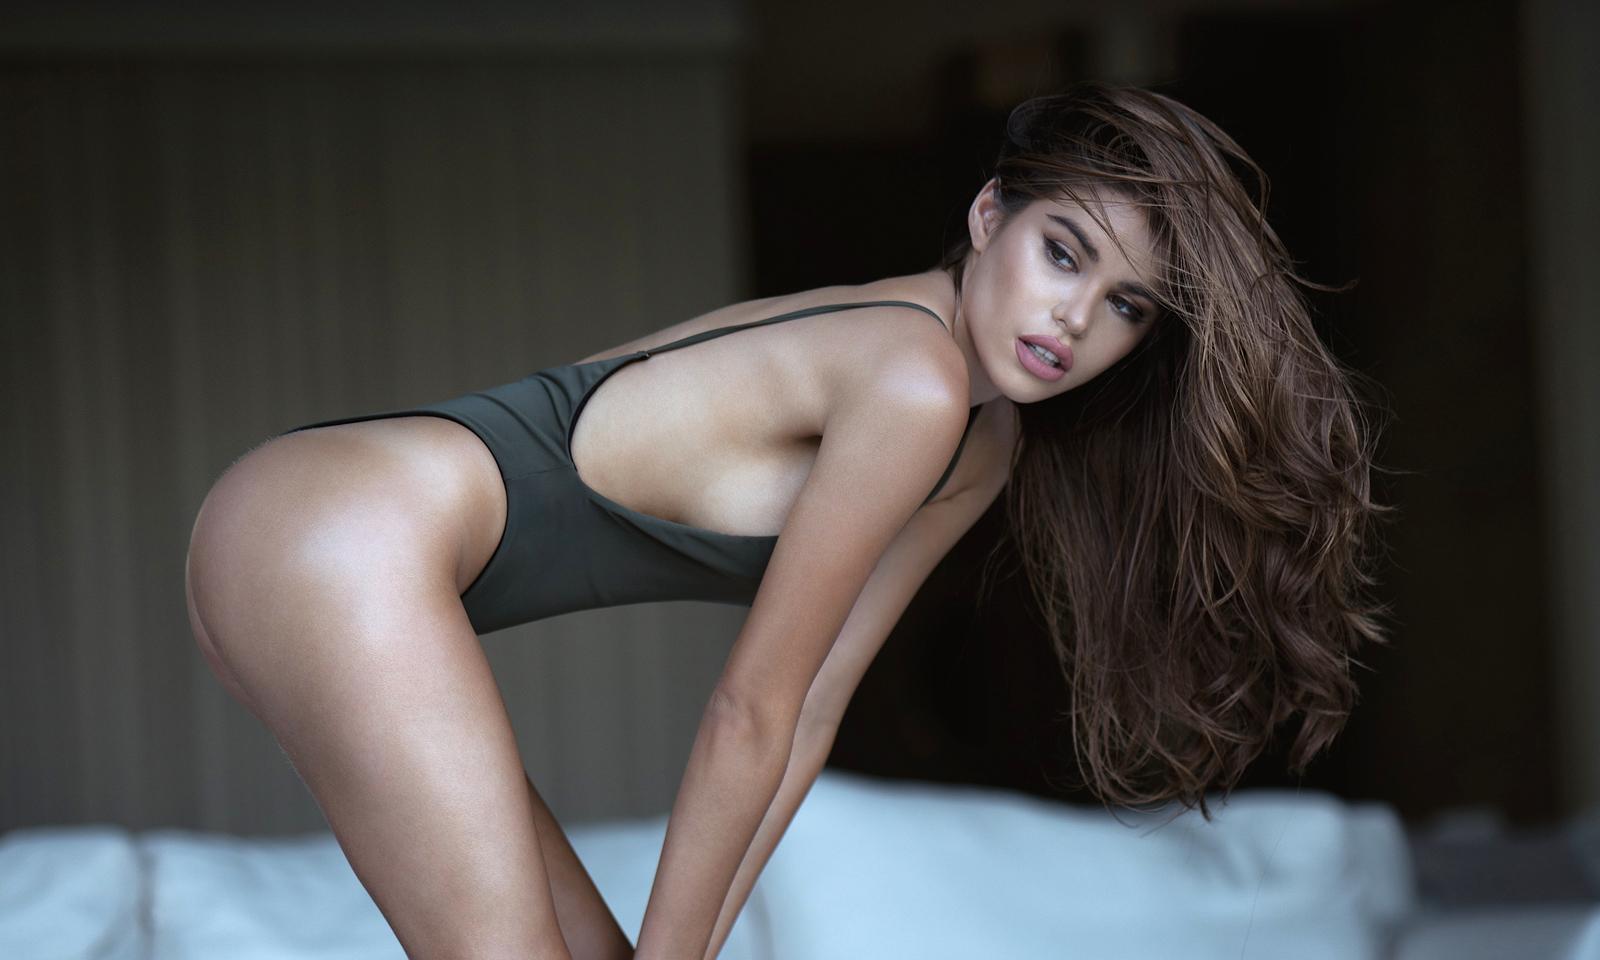 Sexiest-2017-Mabelynn-Capaluj-Dreamsate-Live-lean-forward-Feature